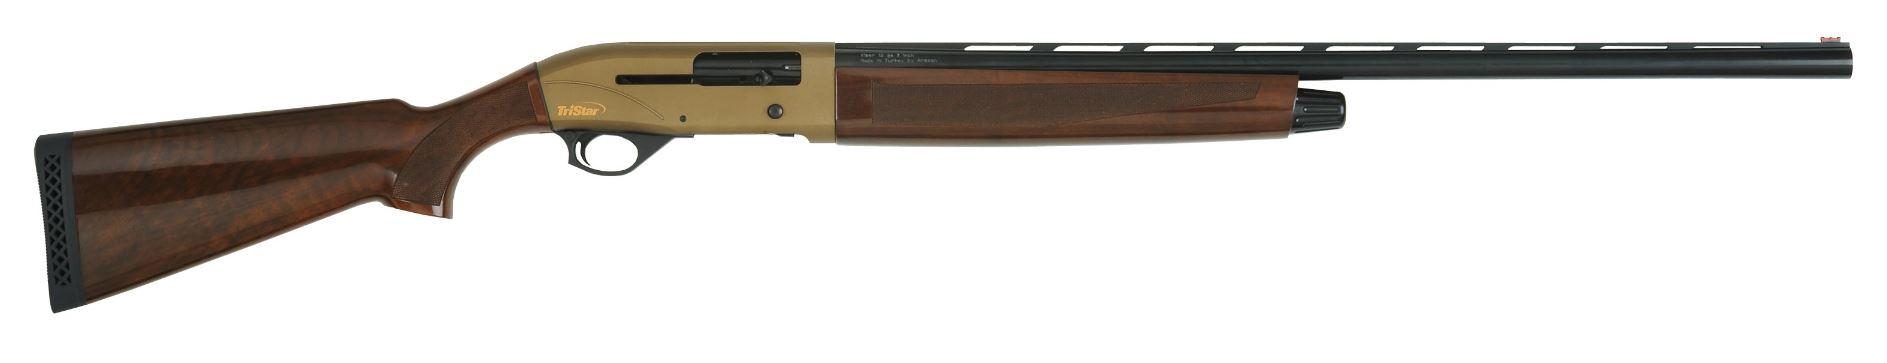 TriStar Sporting Arms VIPER G2 BRONZE 28 GAUGE